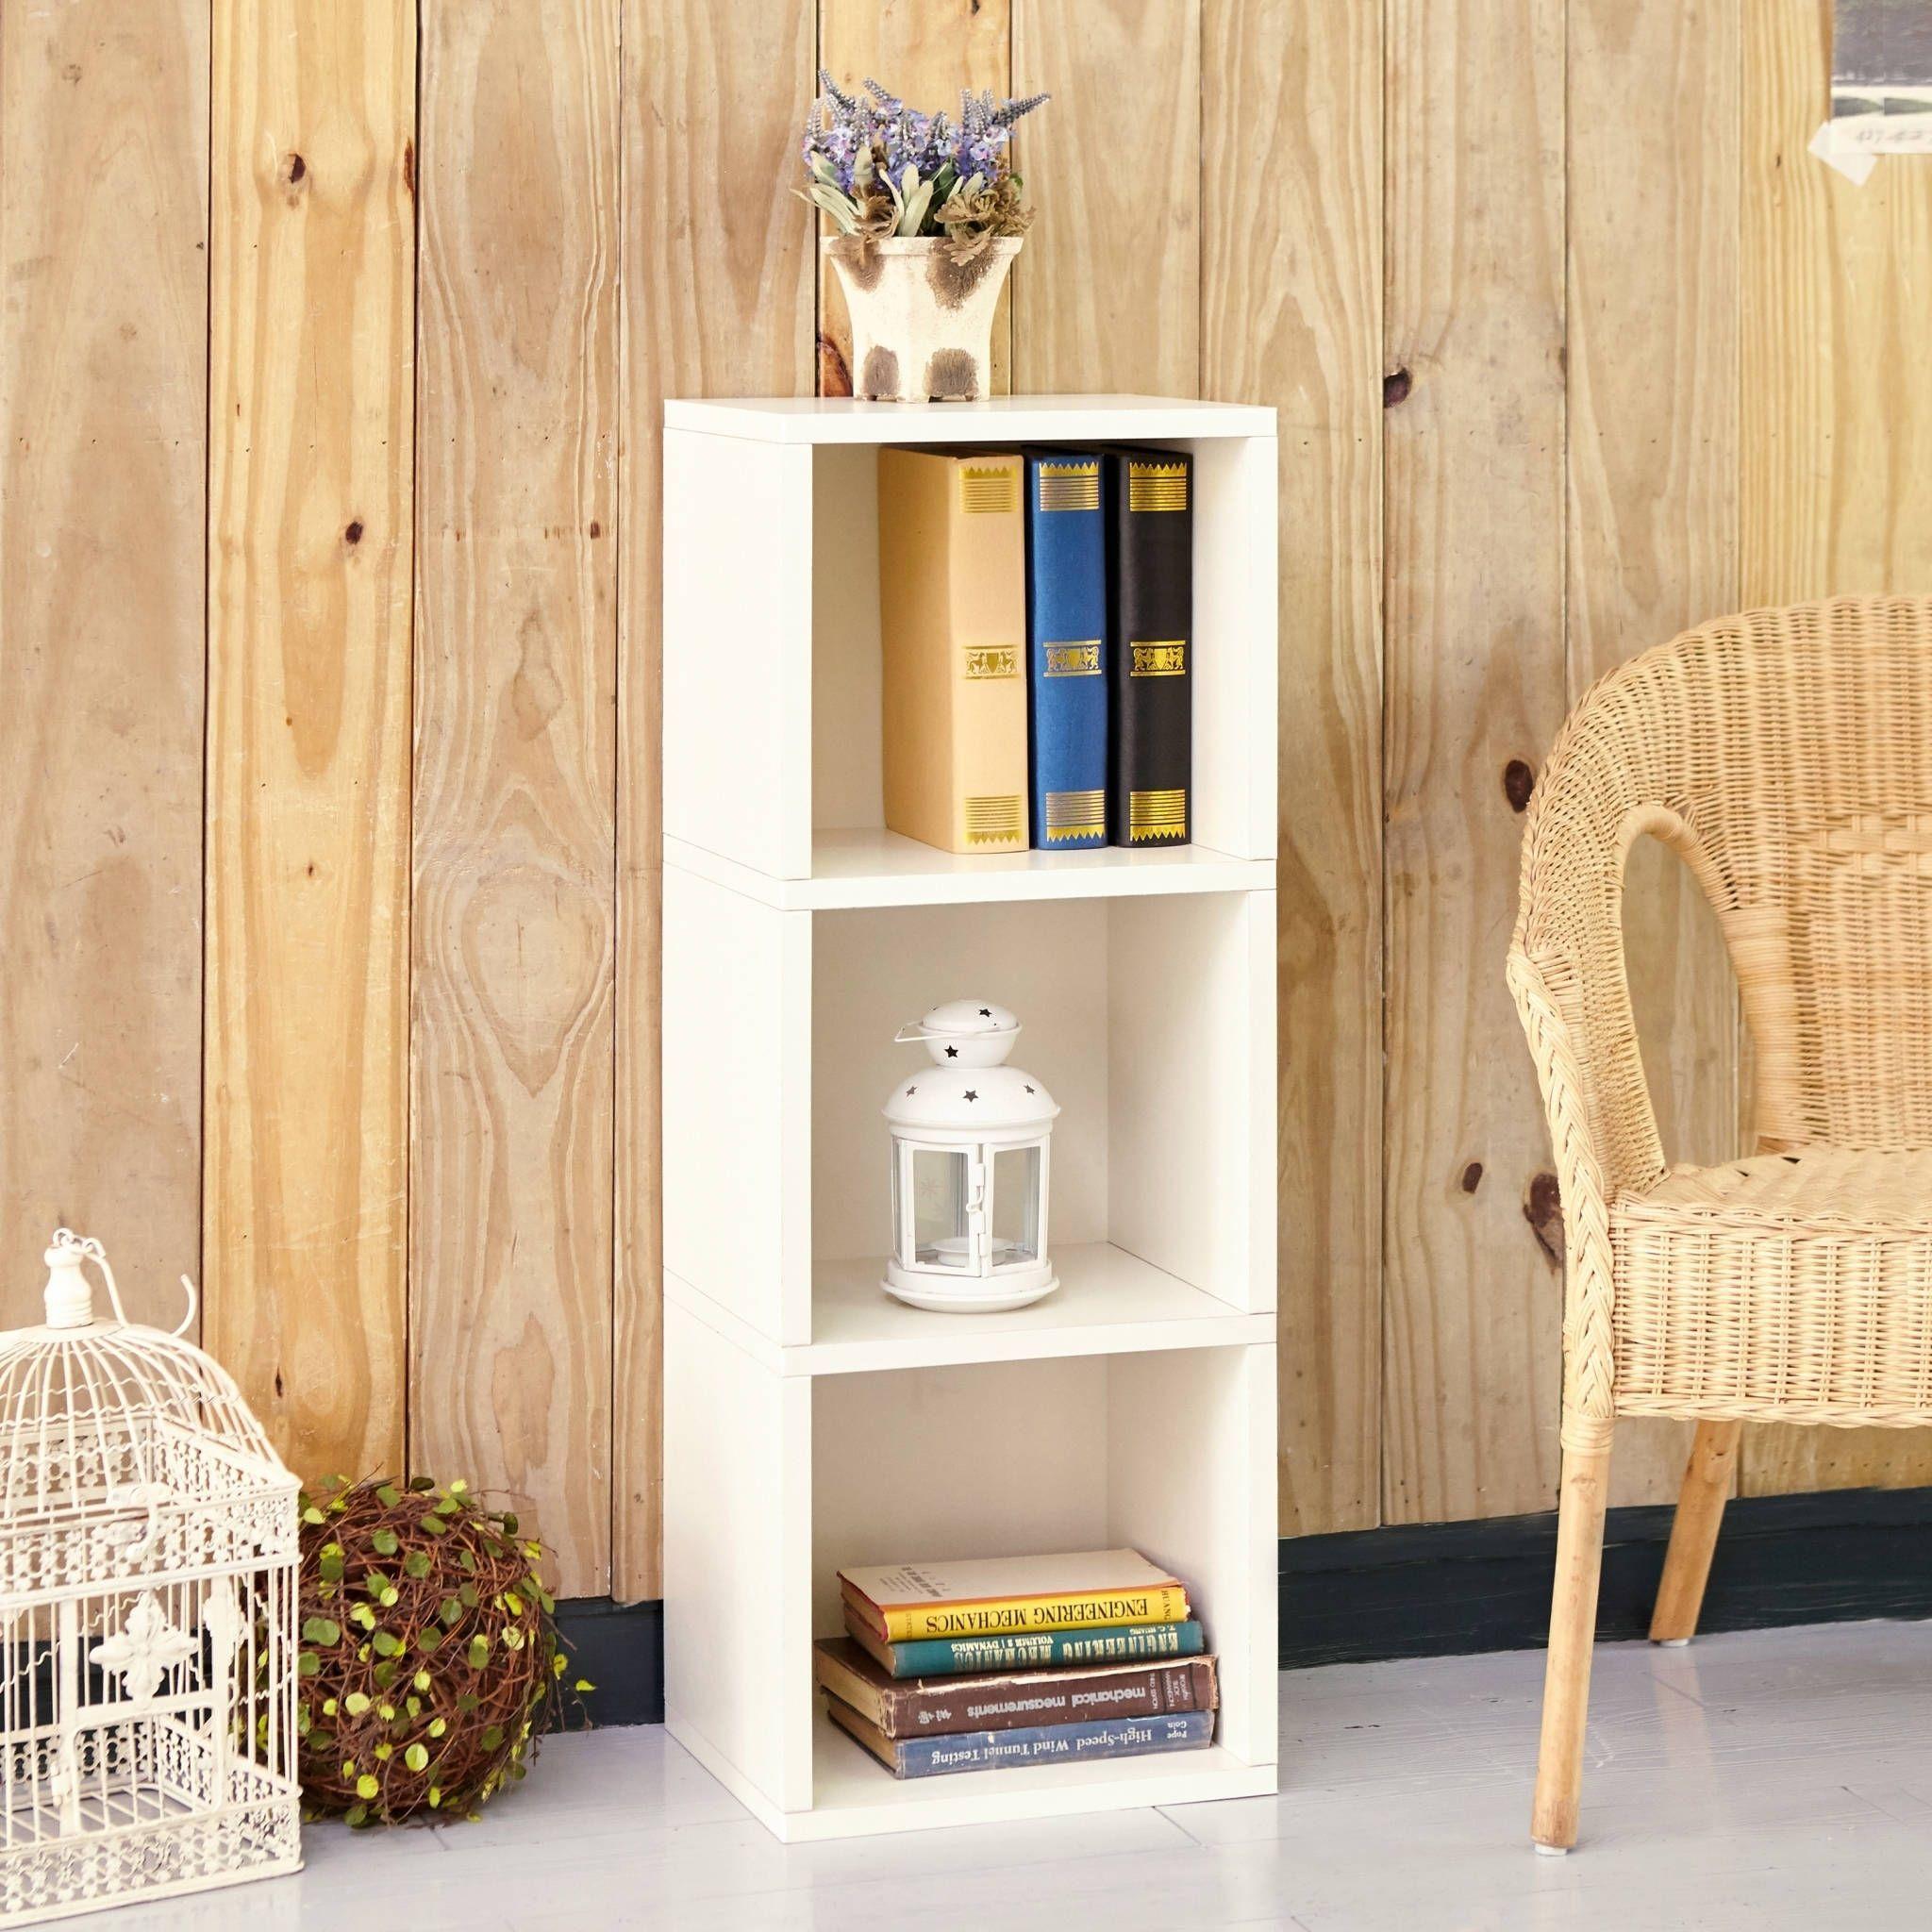 Way Basics Wynwood Eco 3 Shelf Narrow Bookcase Storage, White Lifetime